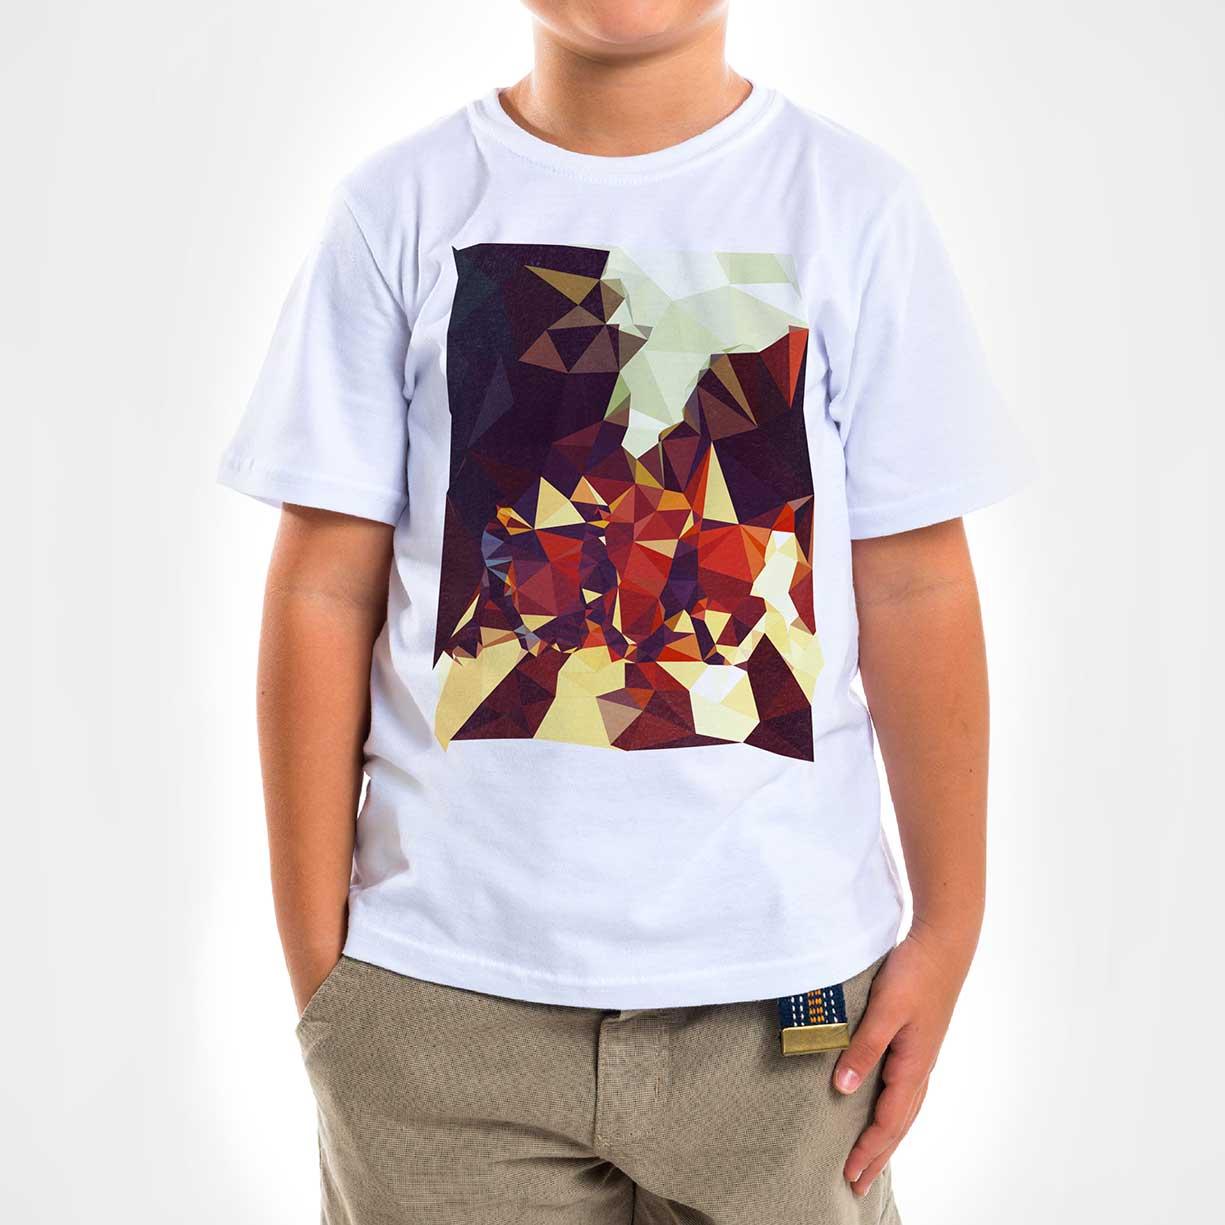 Camisa Infantil - Geometric Abbey Road